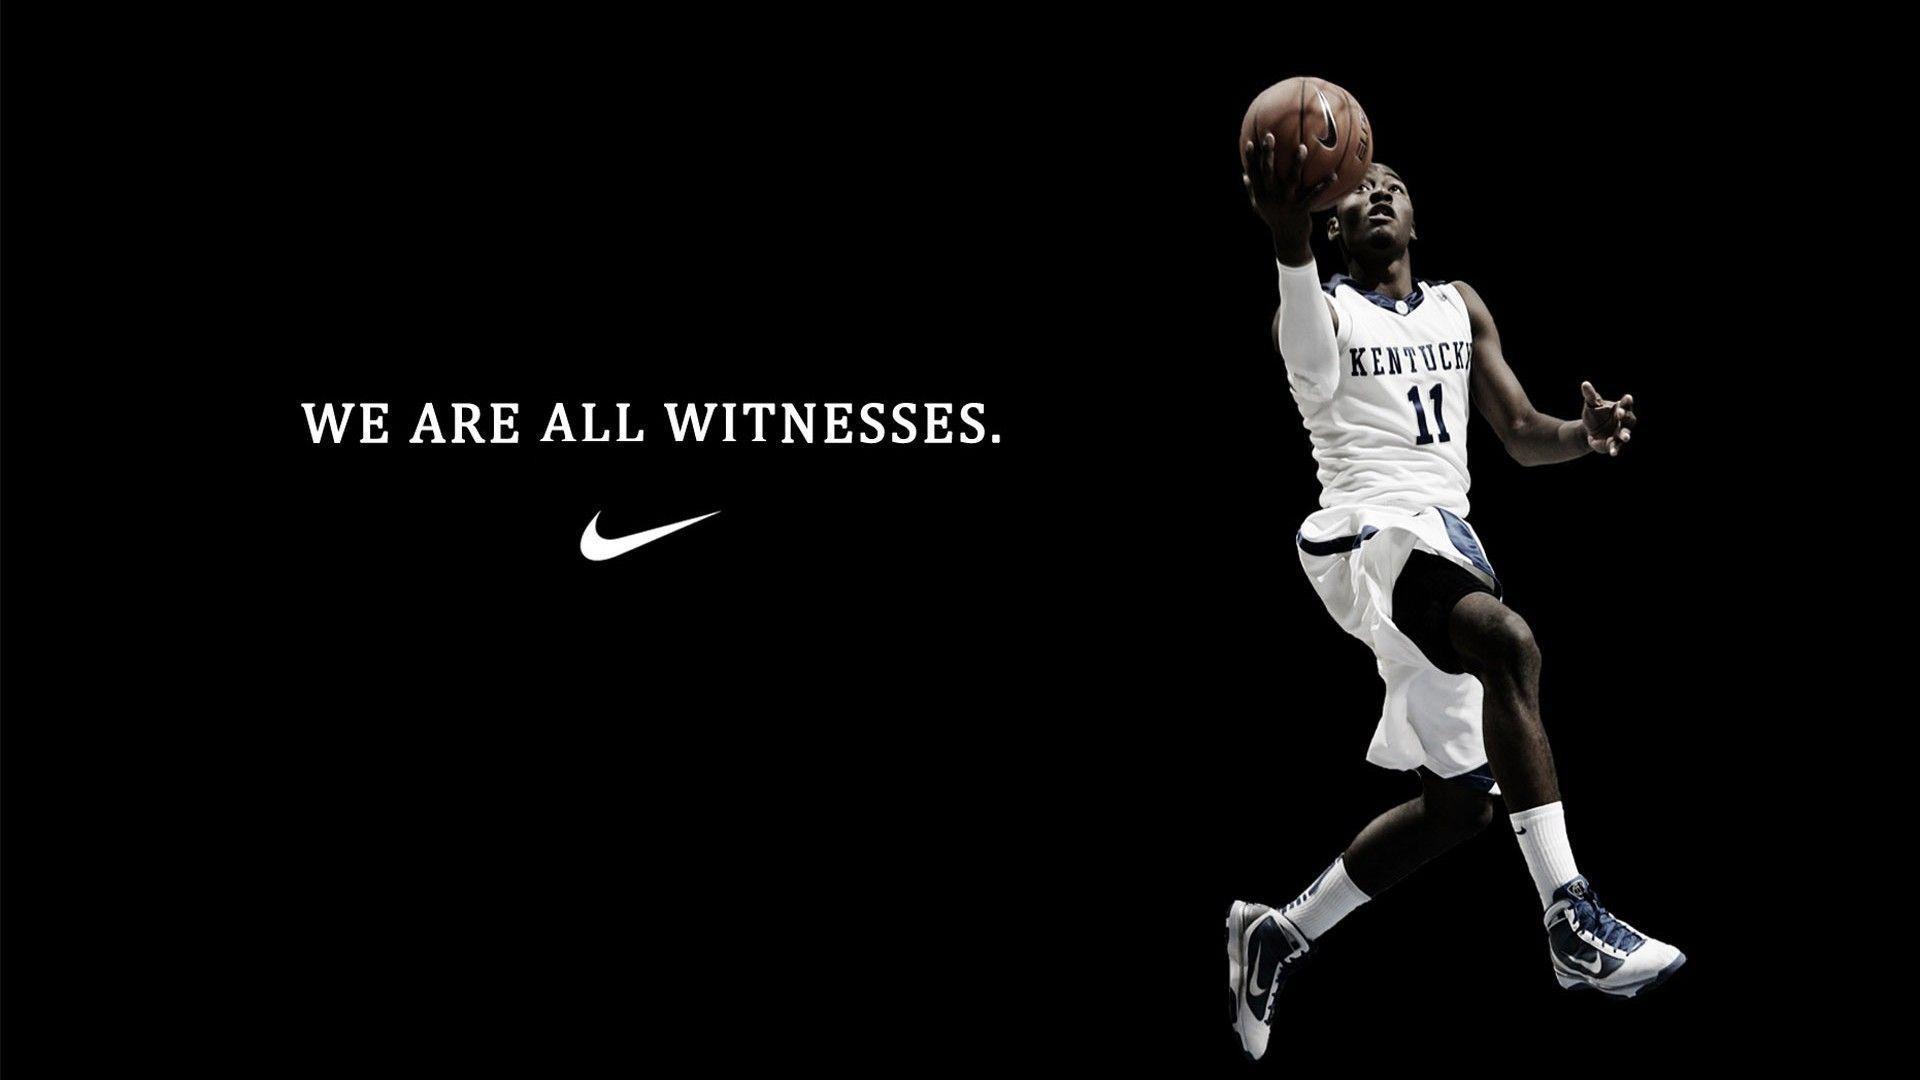 Sports Best Kobe Bryant Basketball Wallpaper for Iphone .